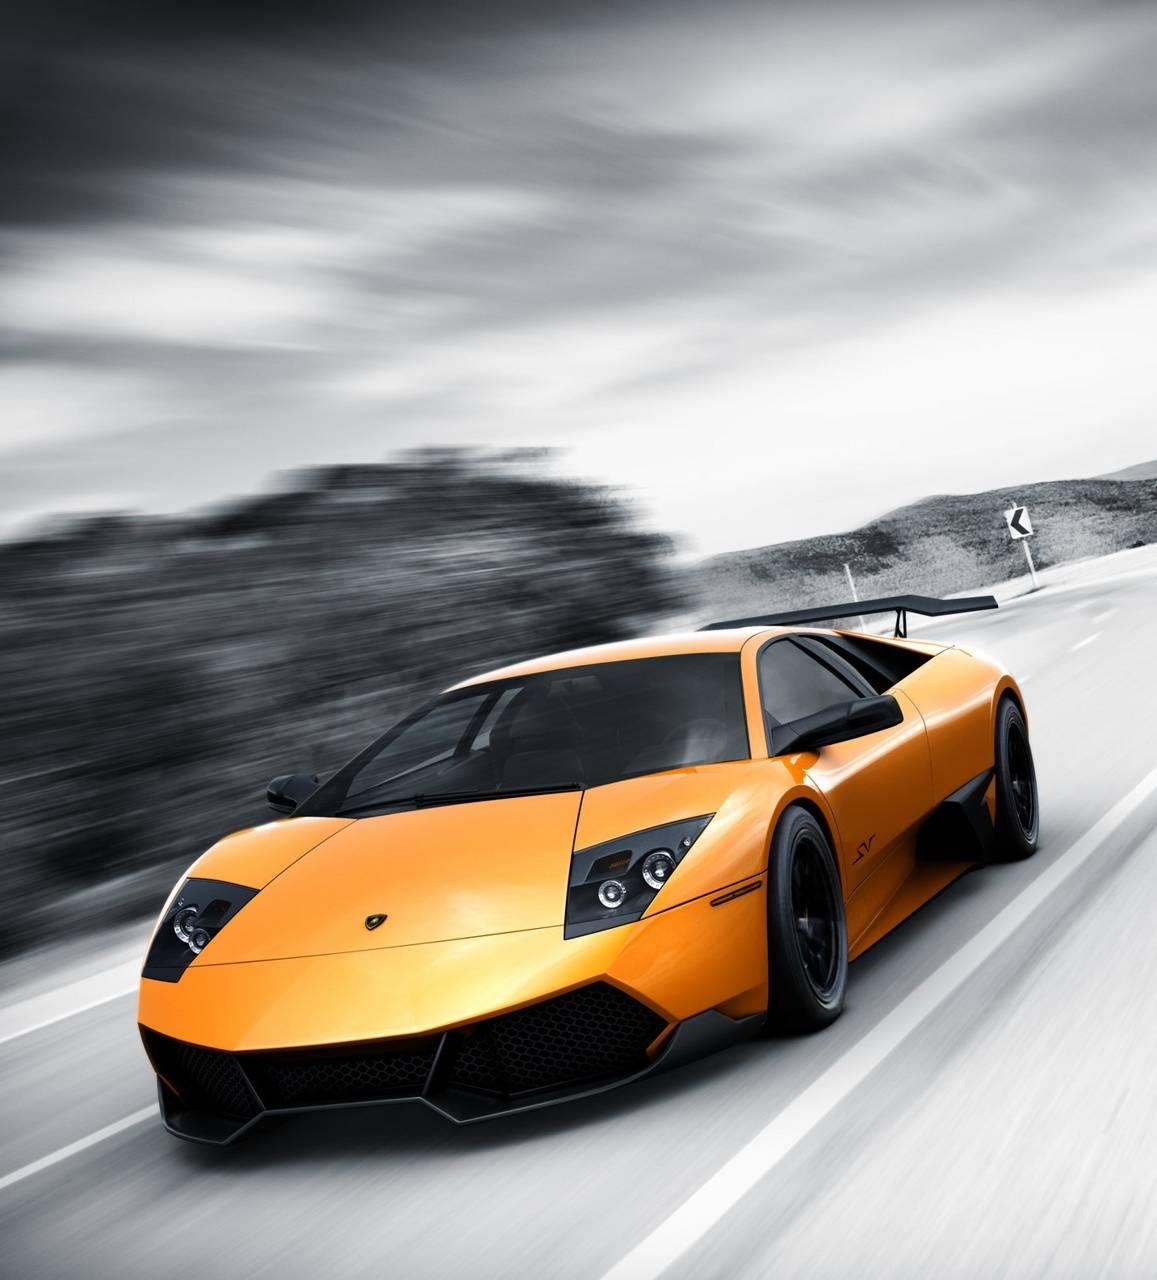 Lamborghini M